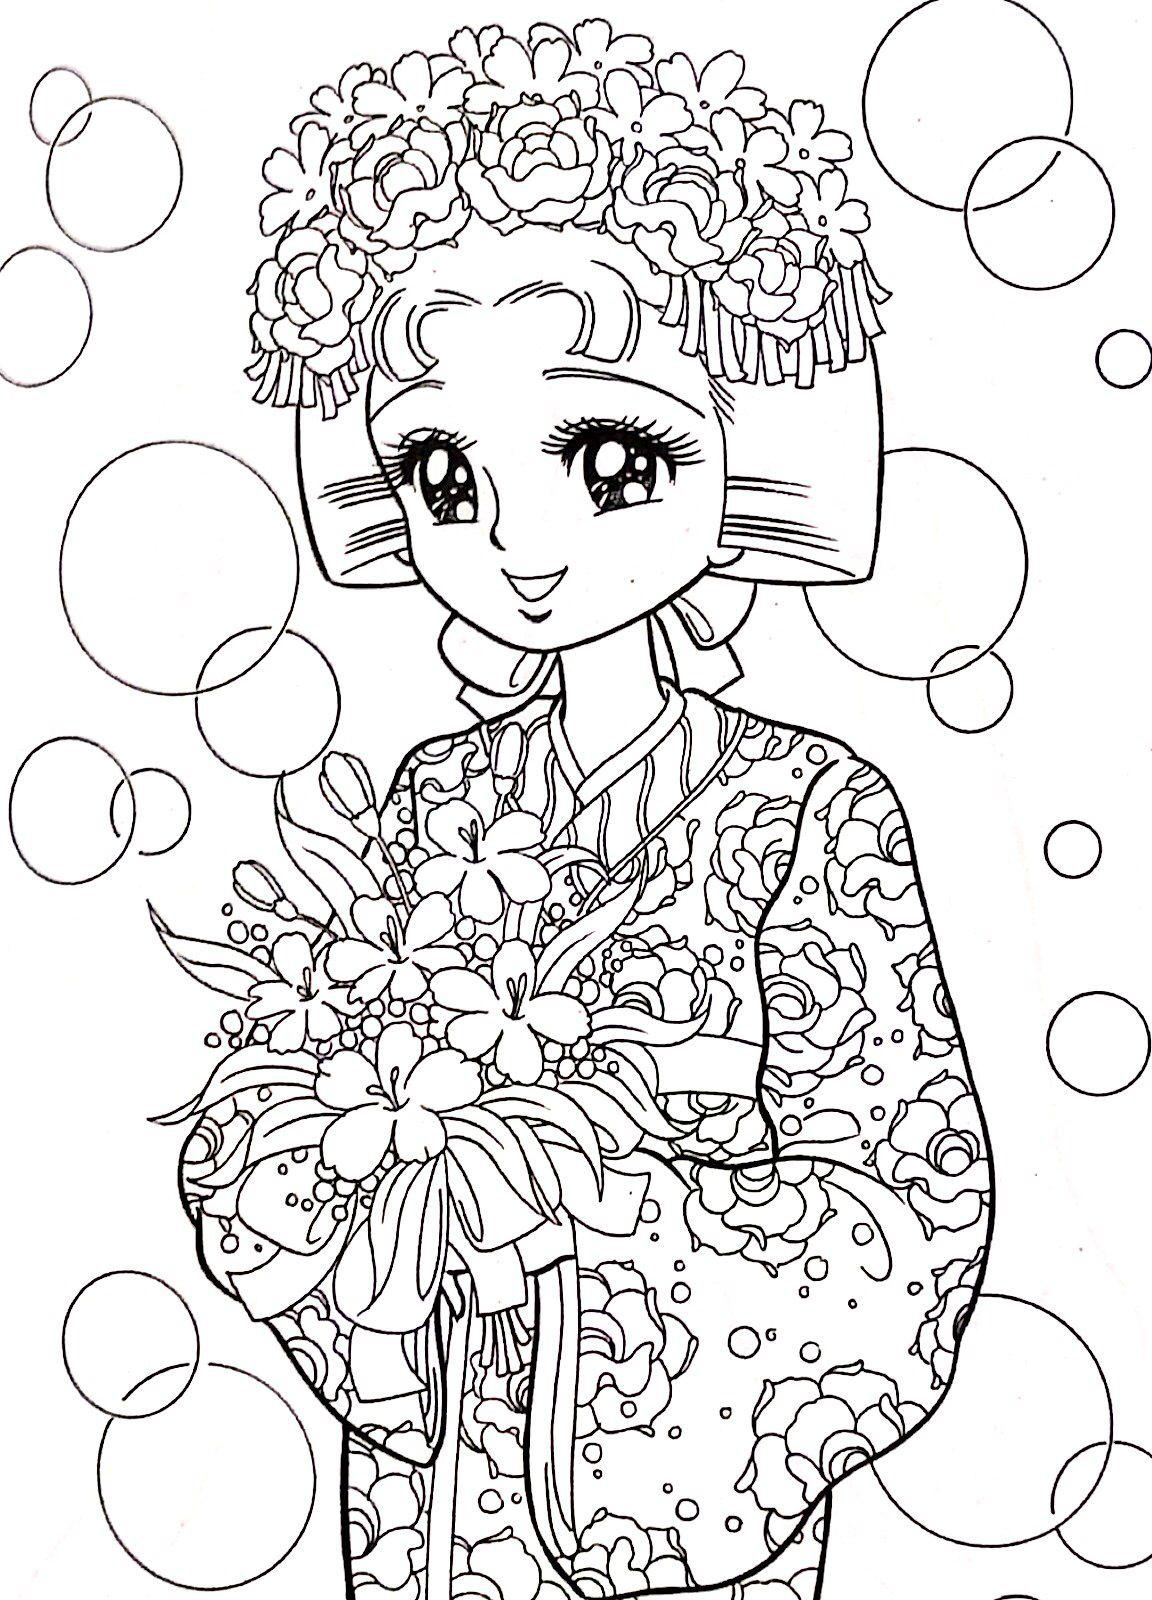 Coloring | Manga coloring book, Coloring book art ...